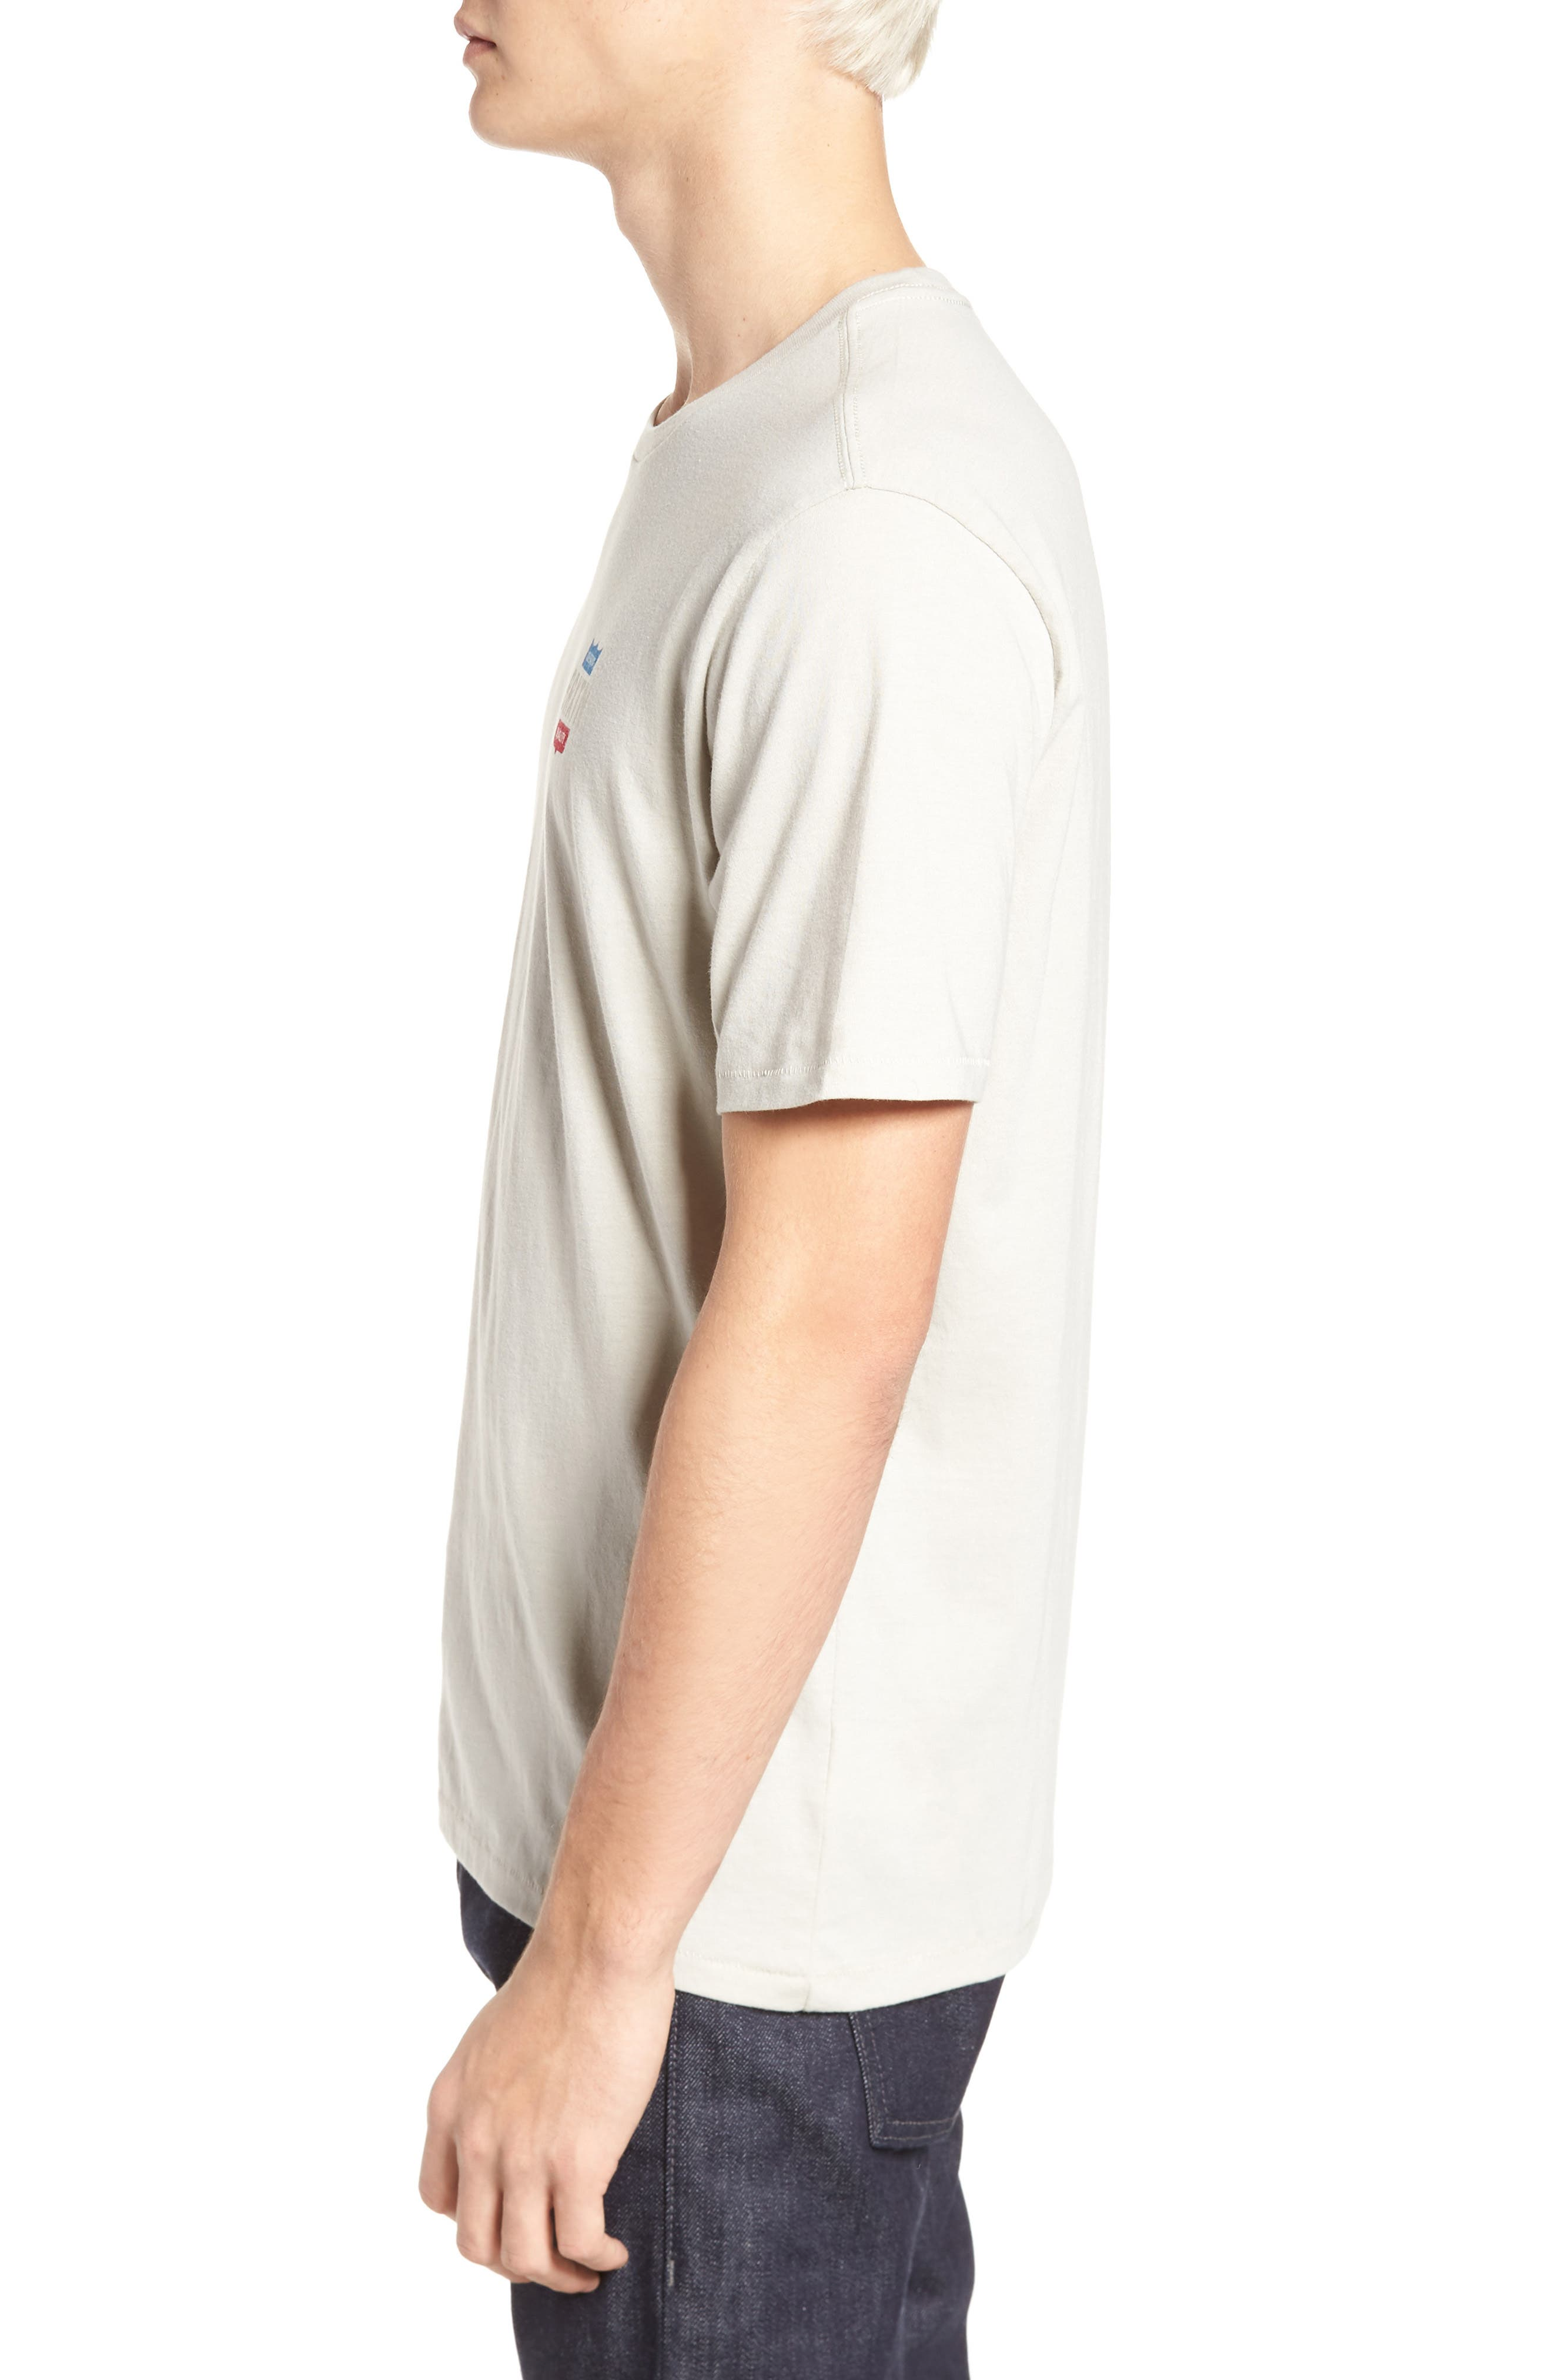 Garth Premium T-Shirt,                             Alternate thumbnail 3, color,                             020